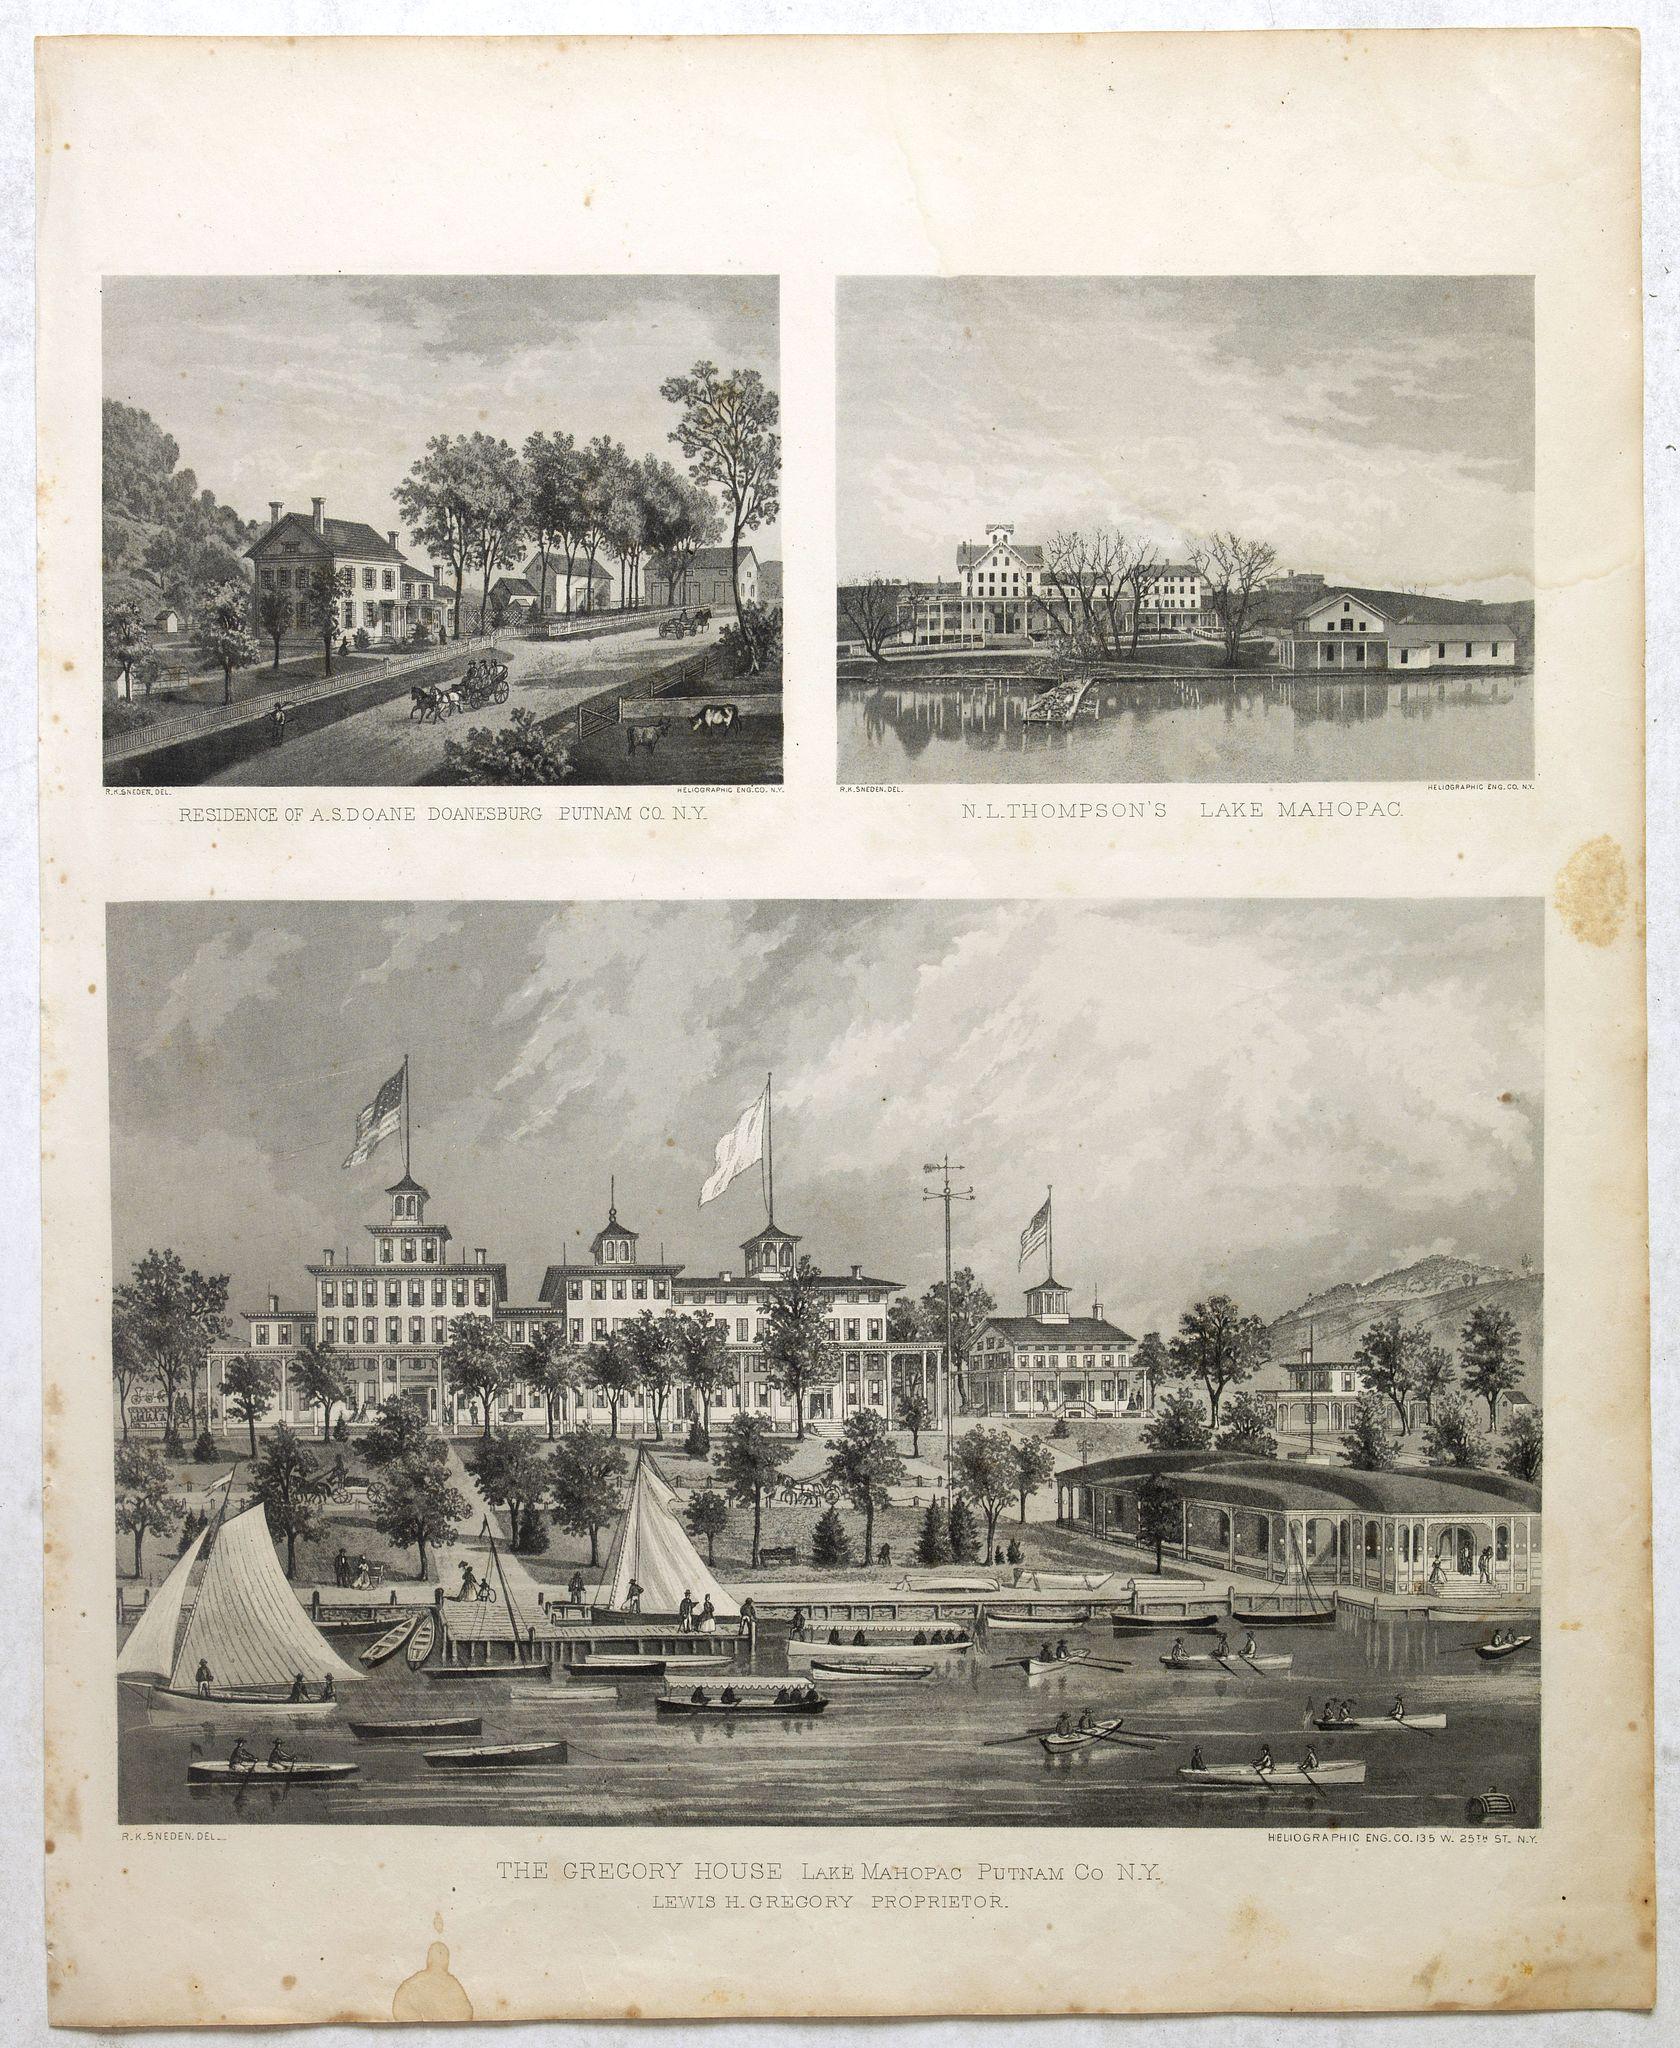 DE BEERS, F.W. -  Residence of A.S. Doane Doanesburg Putnam Co. N.Y. - N. L. Thompsons's lake Mahopac - The Gregory House lake Mahopac Putnam Co N. Y. Lewis H. Gregory Proprietor.